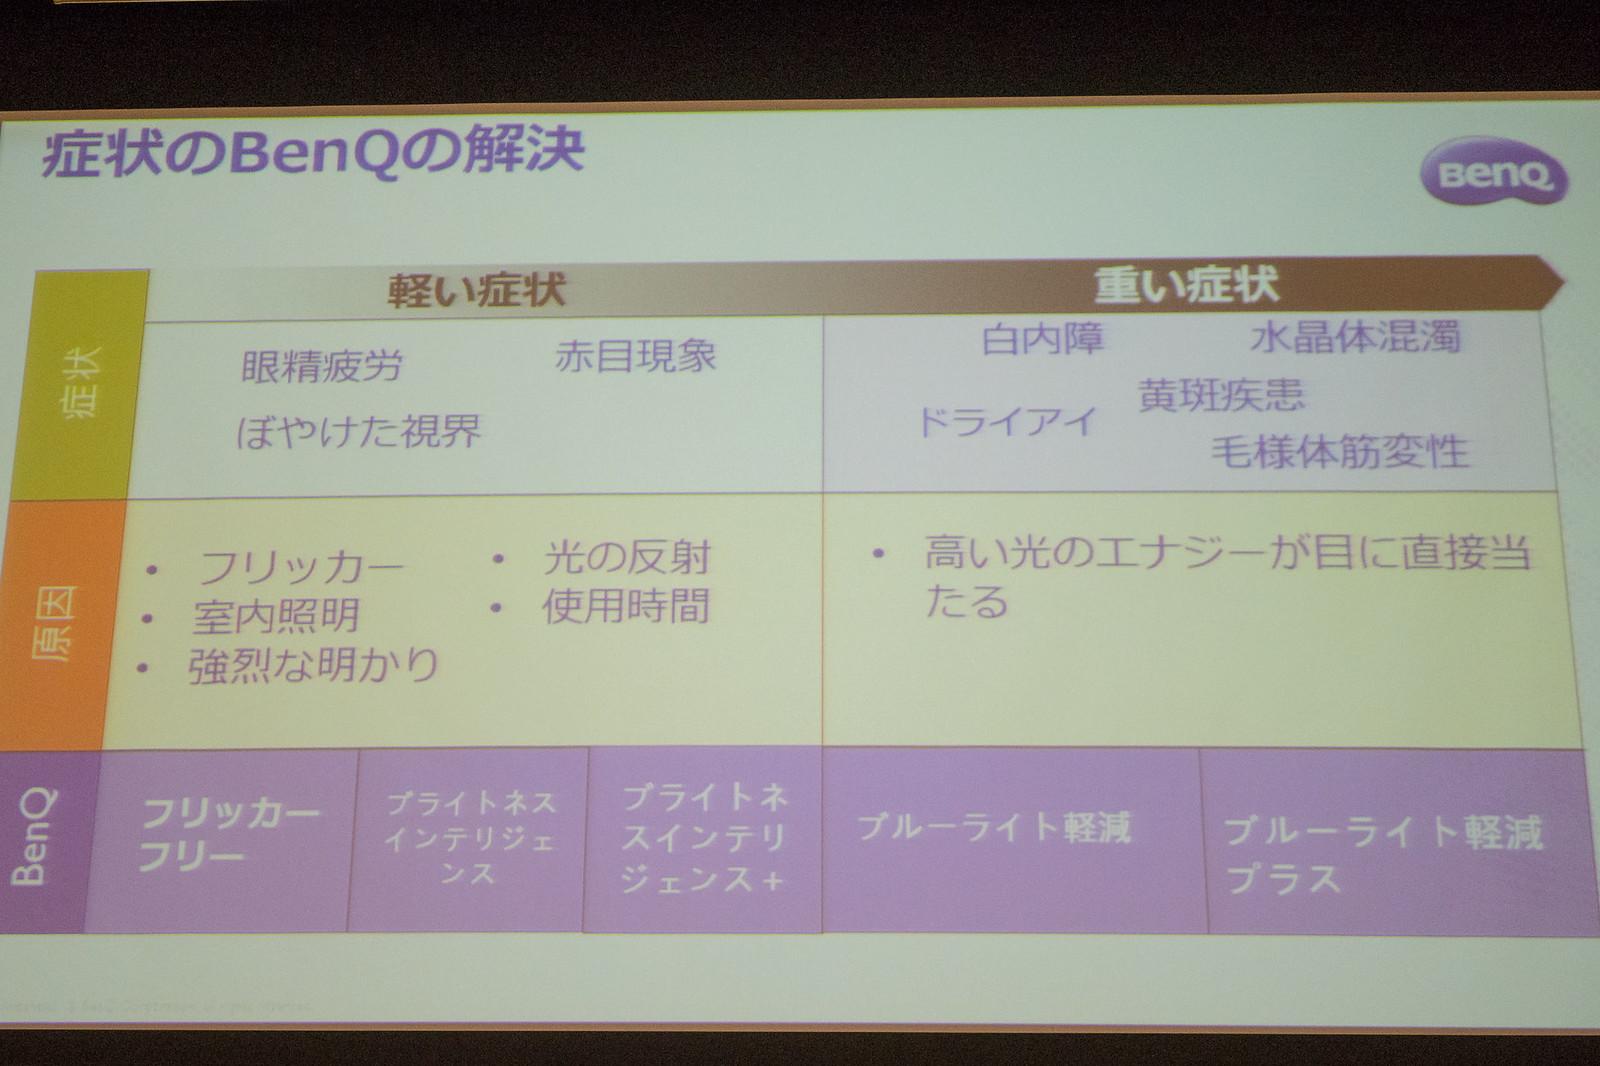 BenQ_events-35